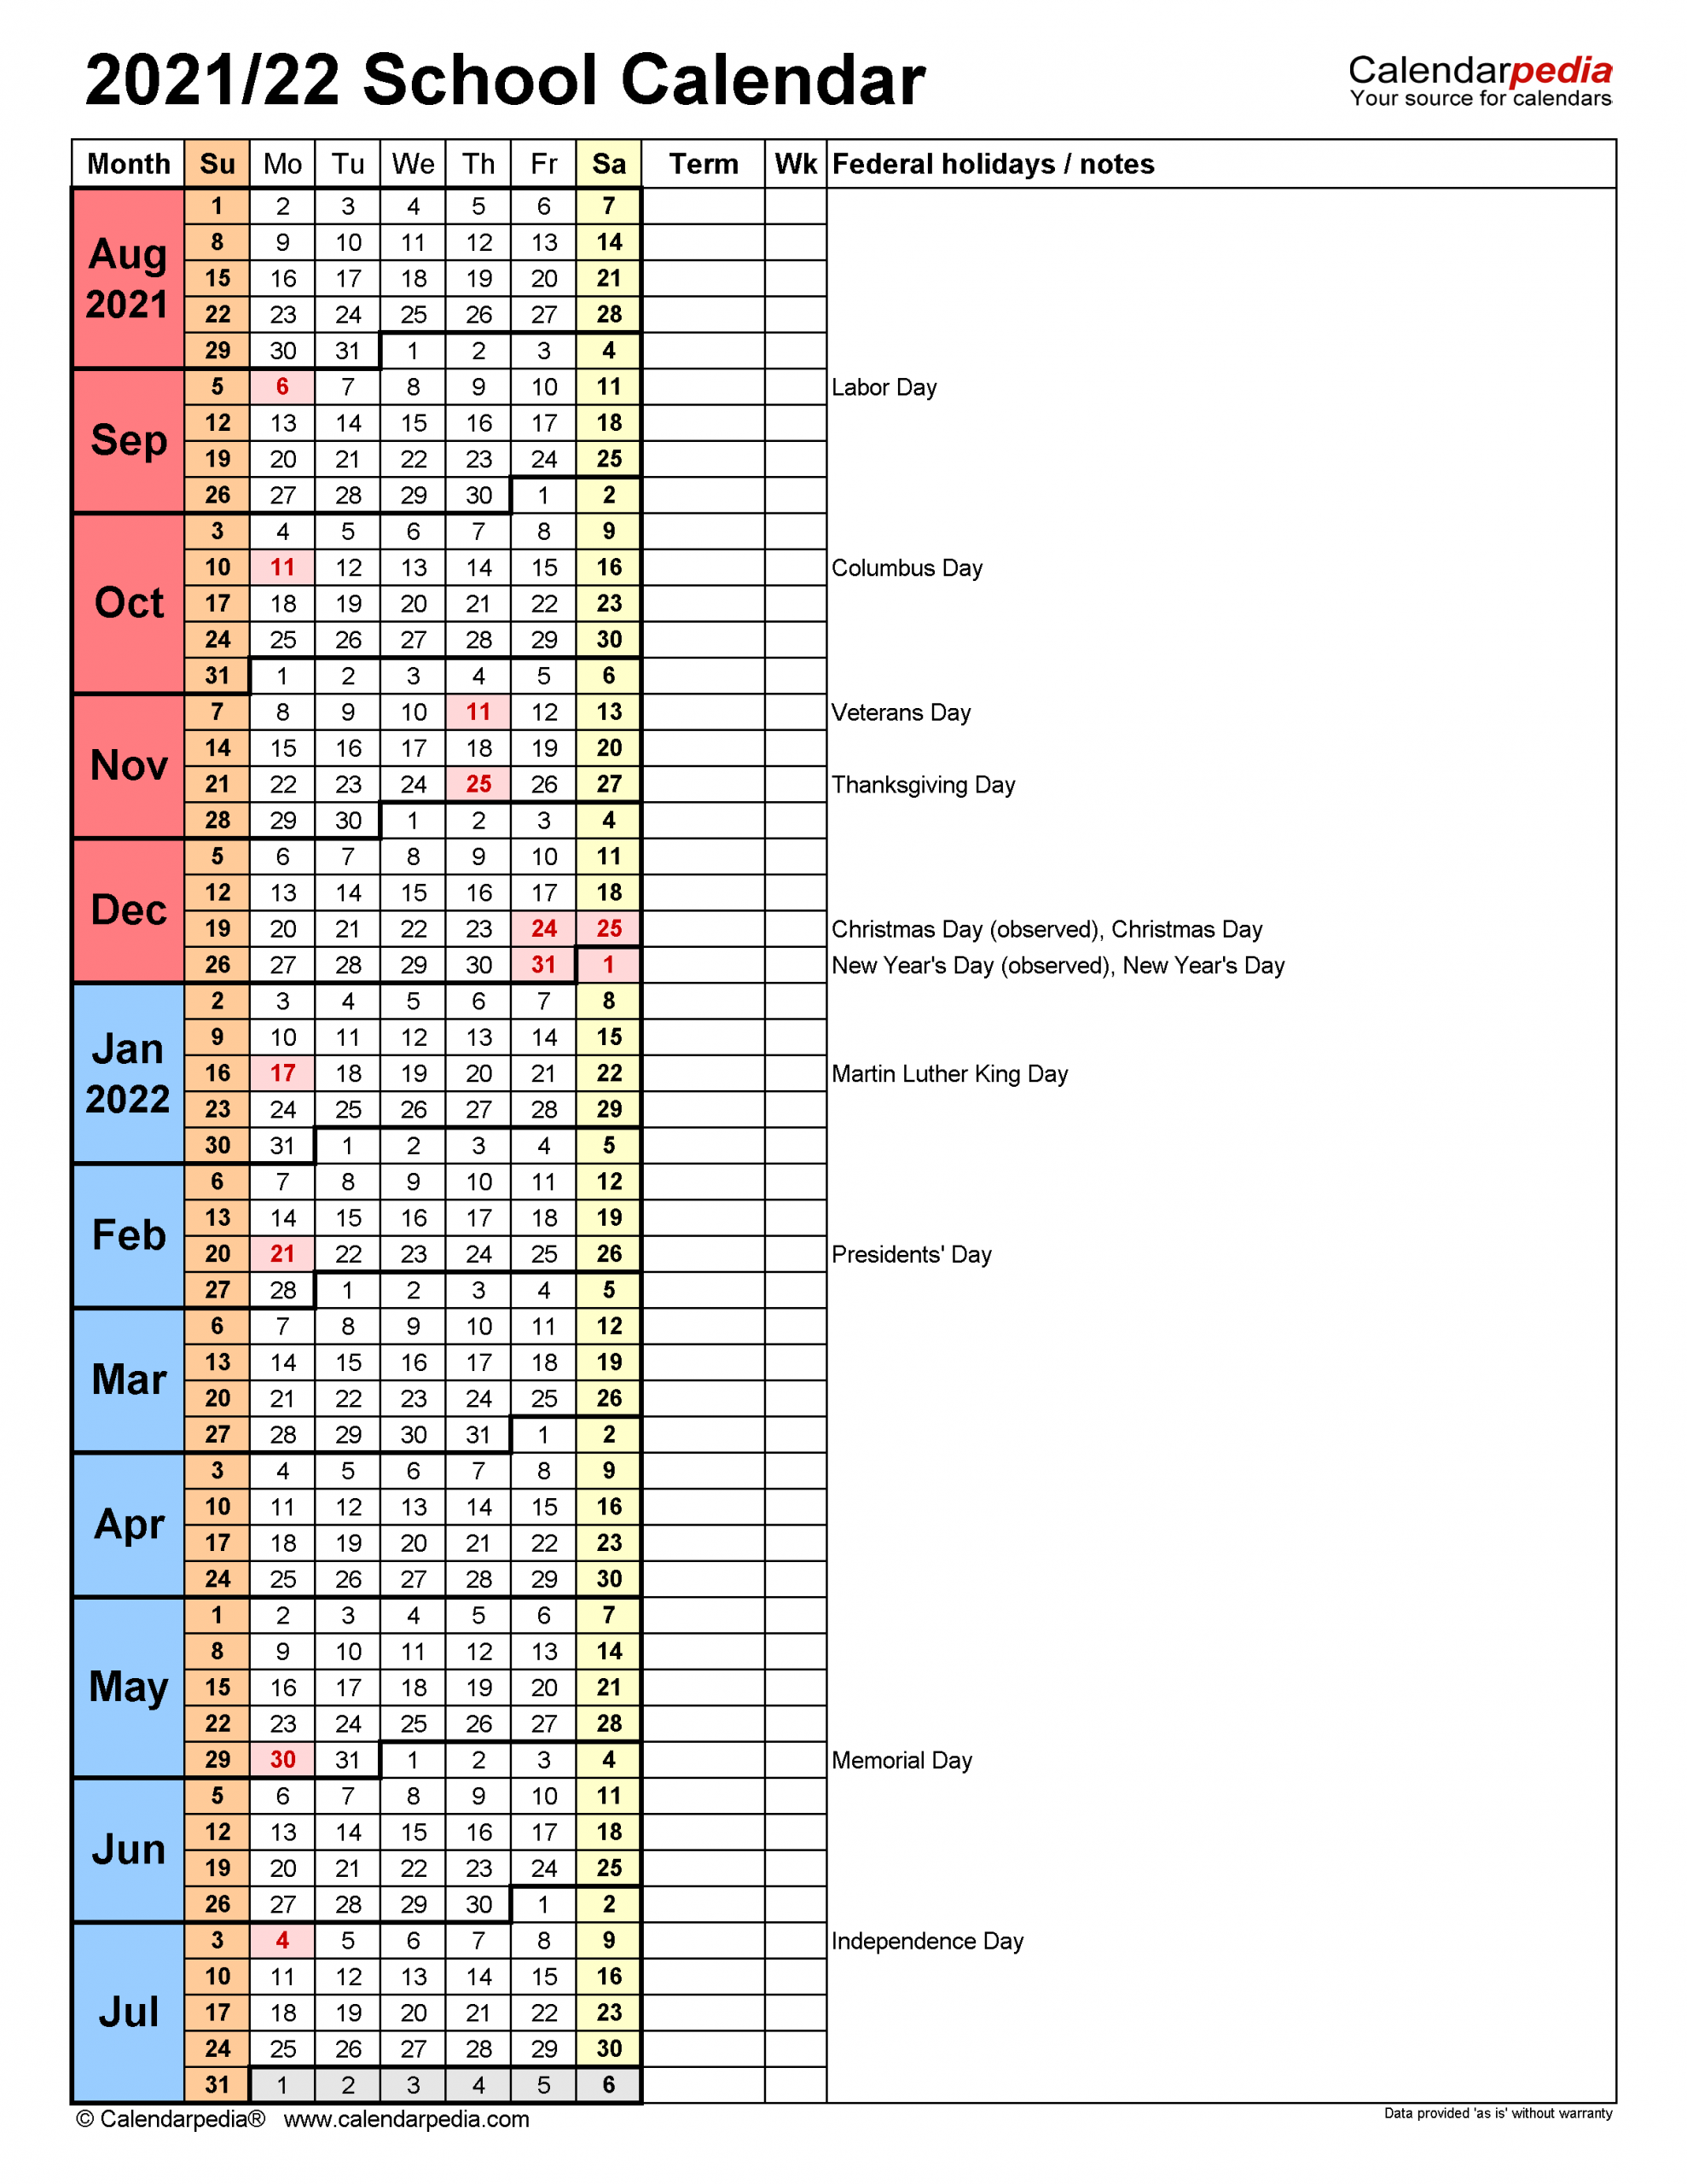 School Calendars 2021 2022 Free Printable Excel Templates